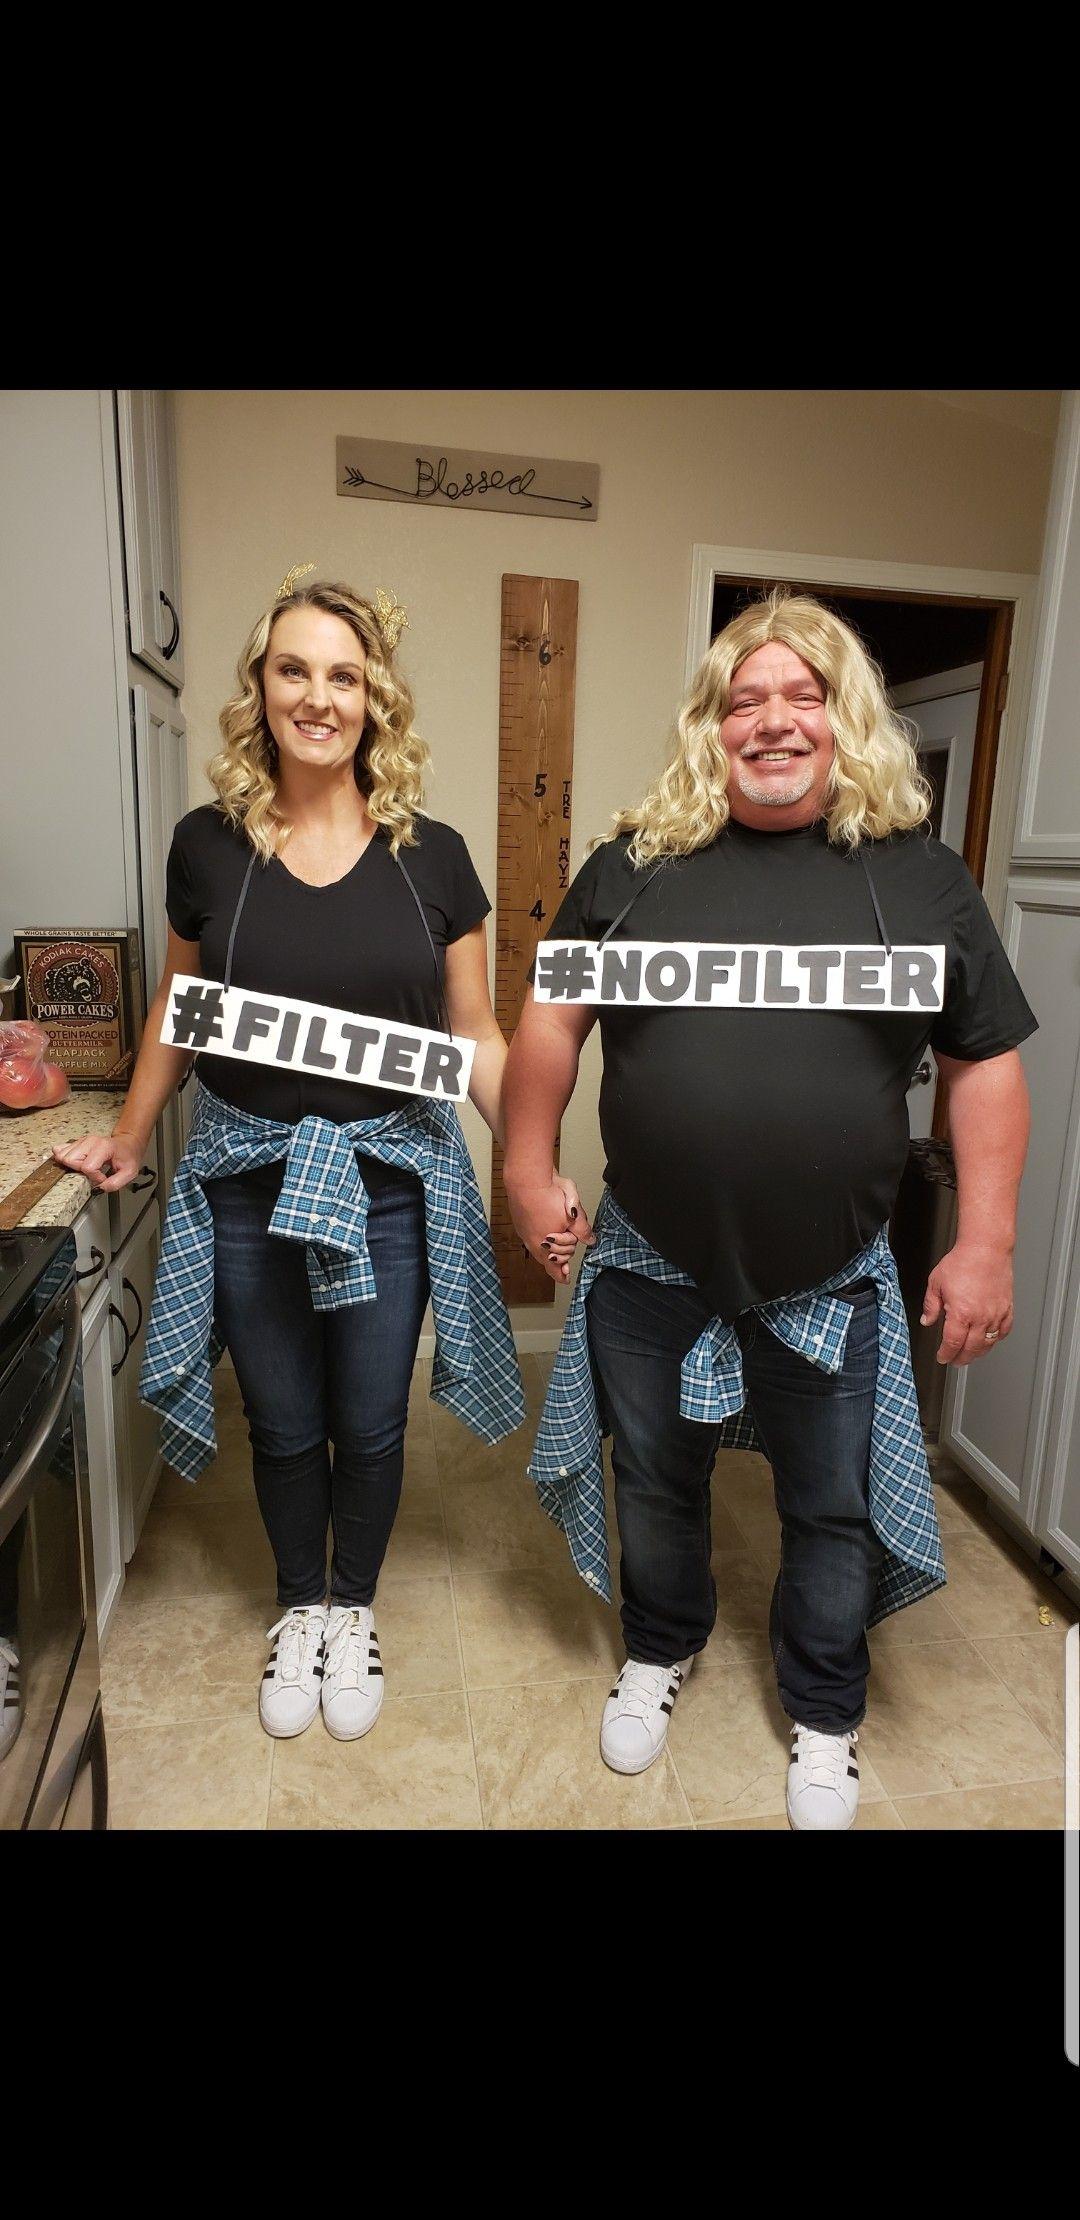 #filter #nofilter couples Halloween costume #coupleshalloweencostumeideas